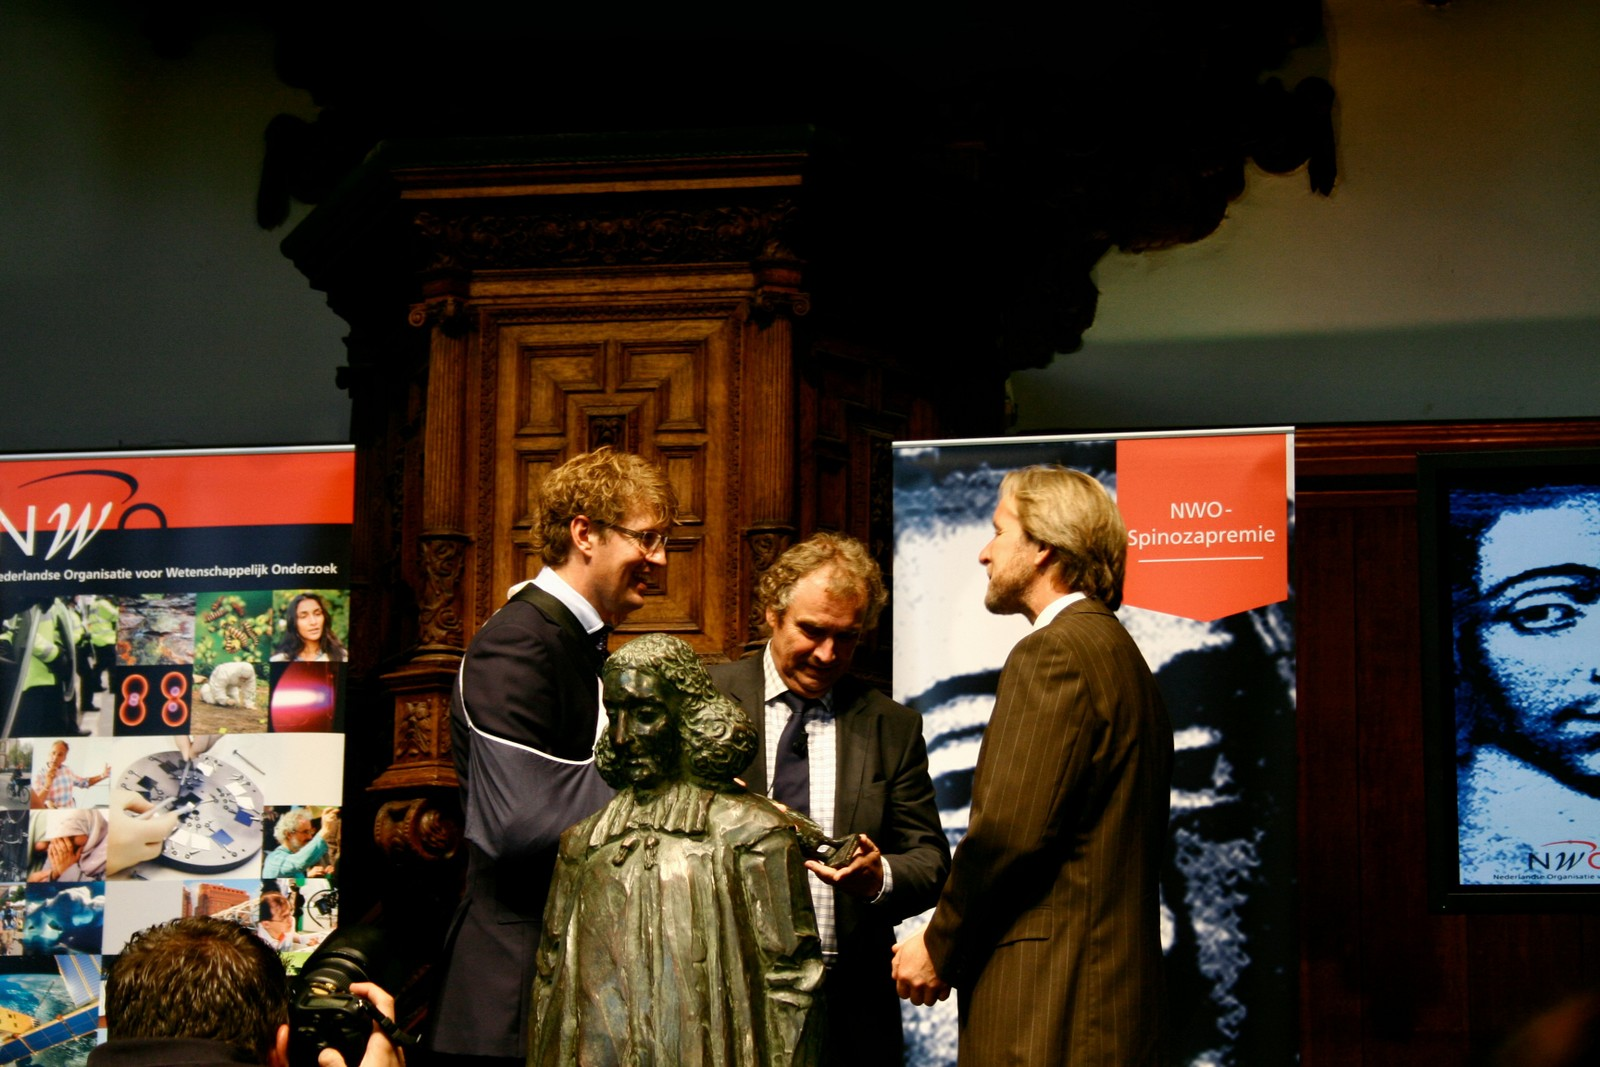 NWO Chair Jos Engelen, State Secretary for Education, Culture and Science Sander Dekker and Piek Vossen